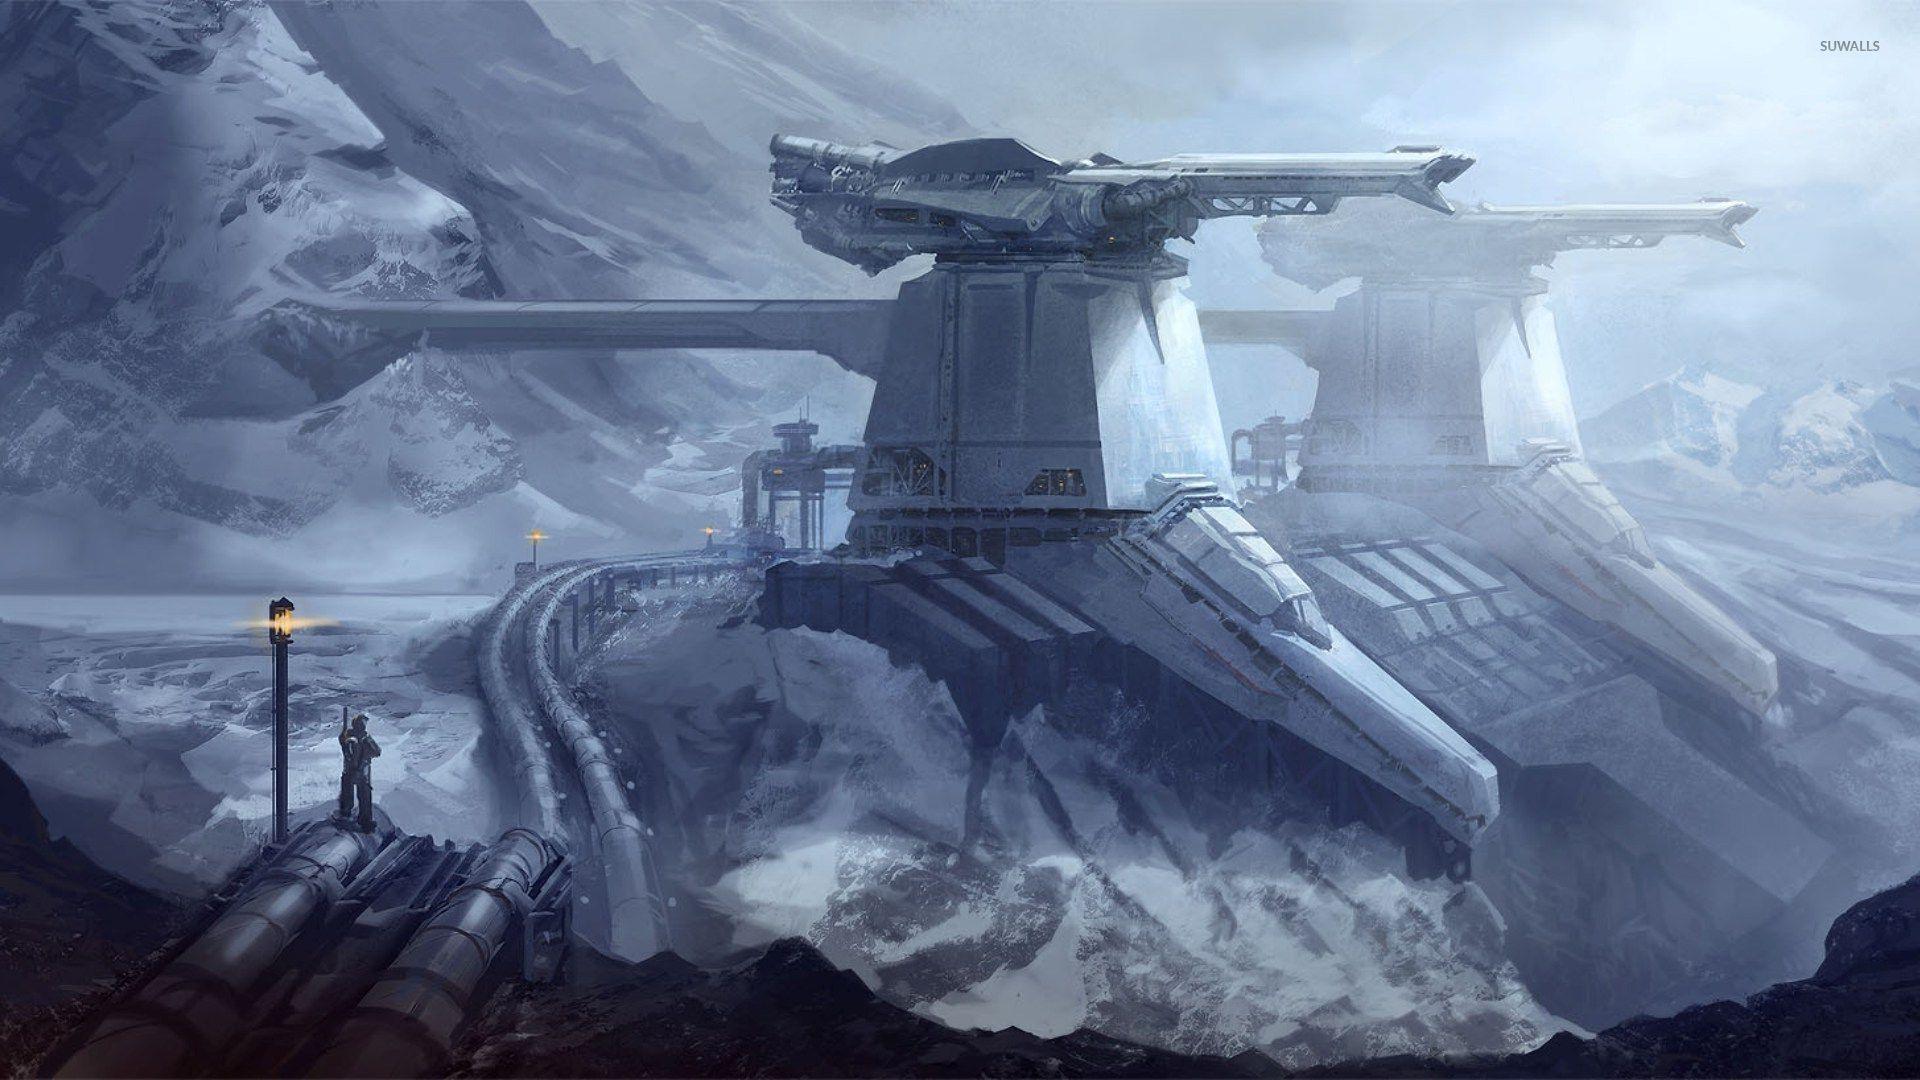 Fantasy Winter Mountain Snow Weapon Fortress Cyberpunk 1920x1080 jpg